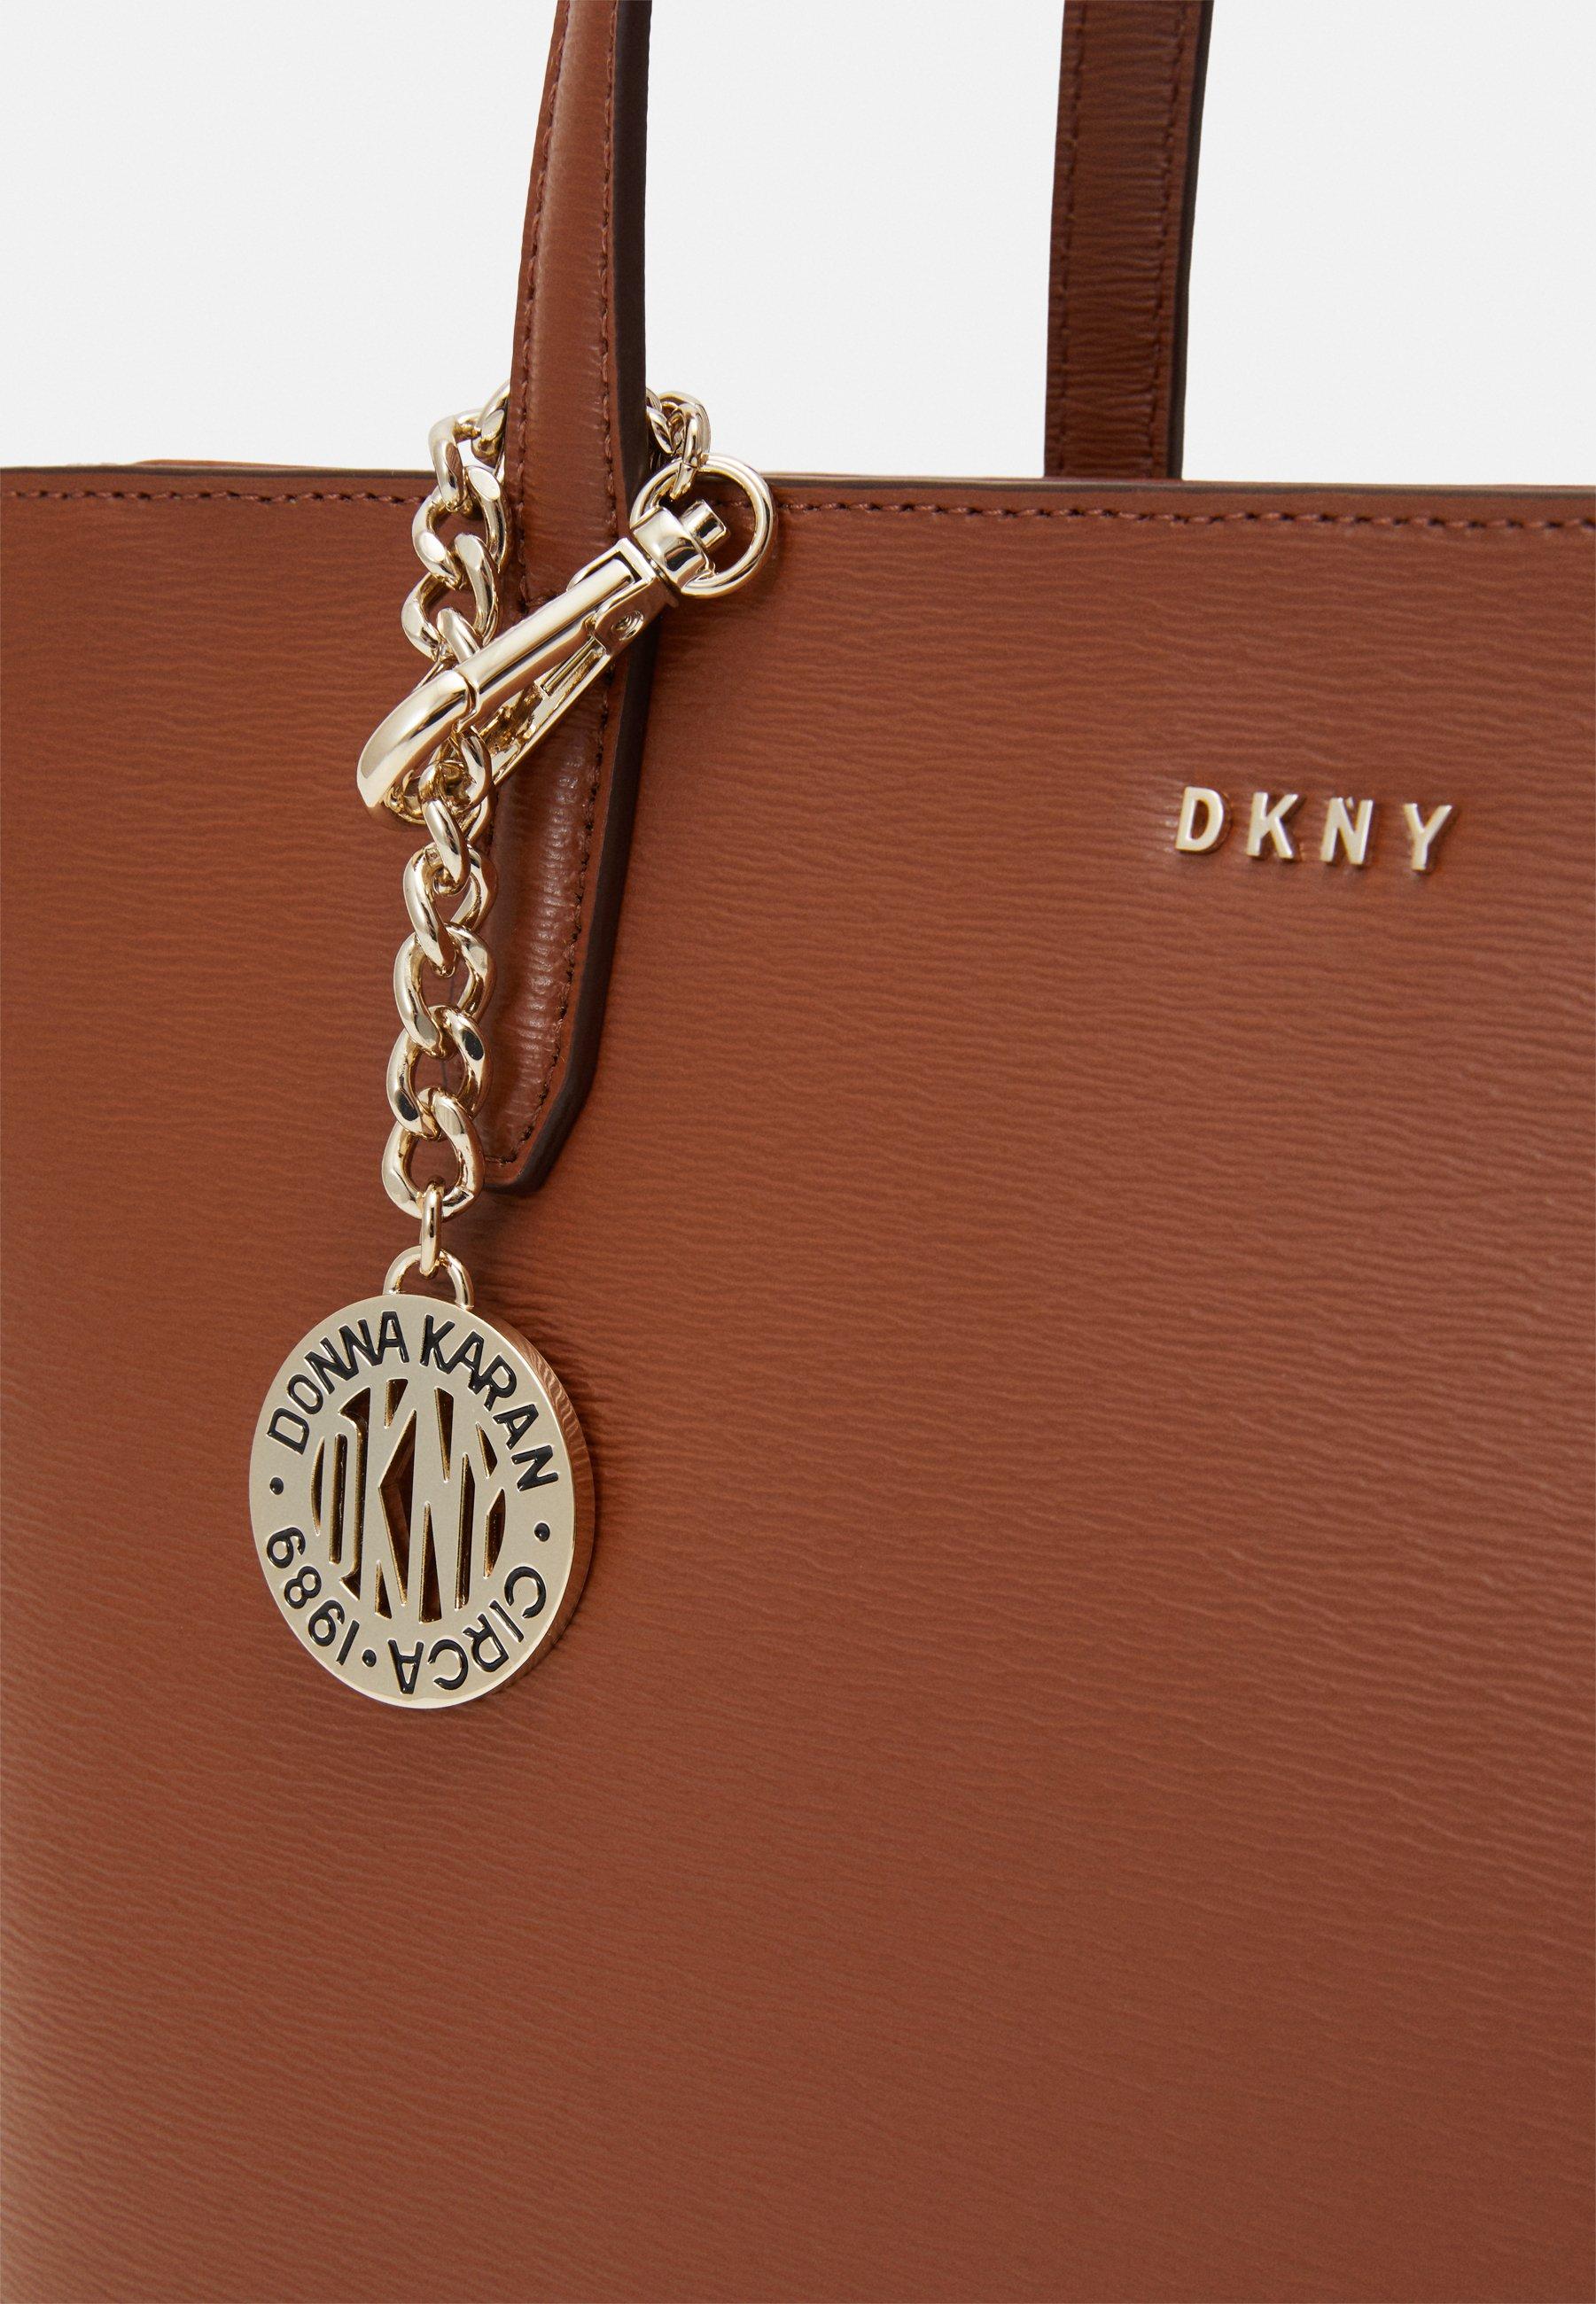 Dkny Bryant Box Sutton - Handtasche Caramel/tan